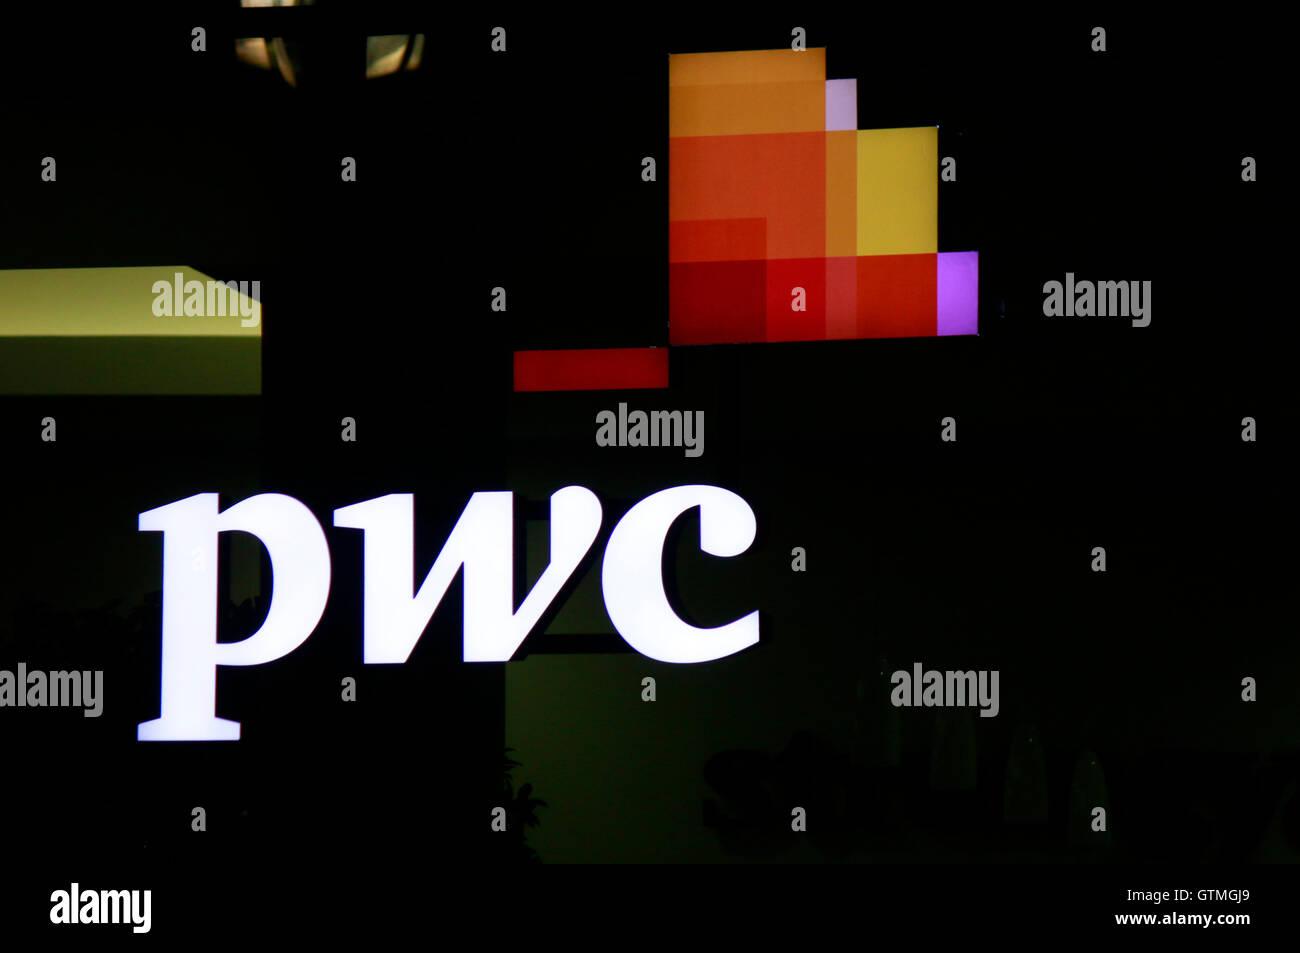 Logo der Marke 'pwc', Berlin. - Stock Image